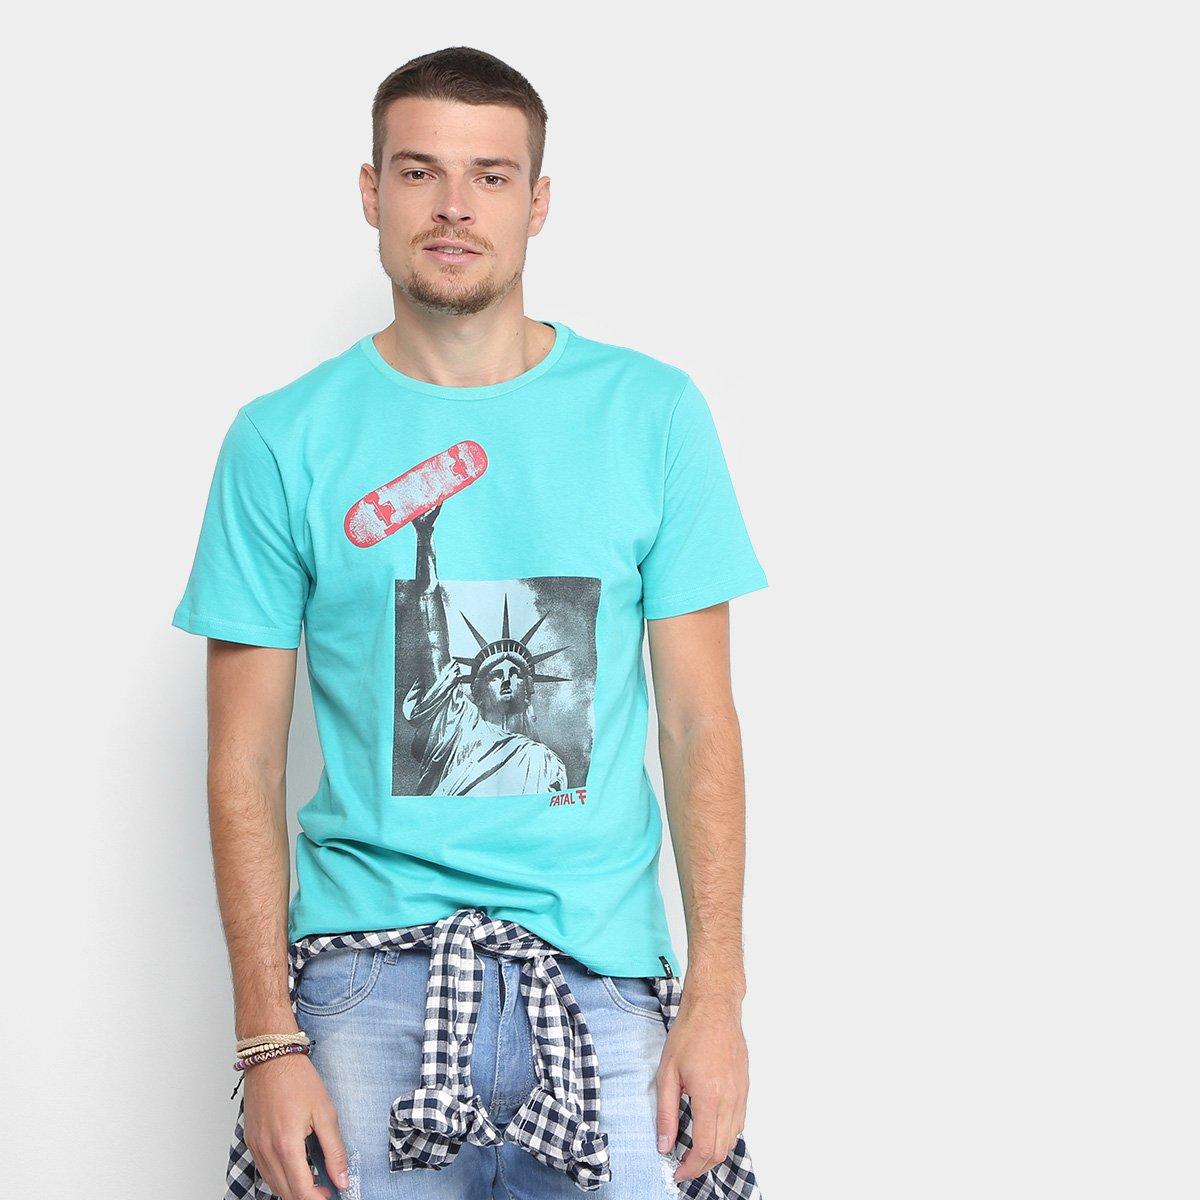 aeb02362e7742 Camiseta Fatal Estampada Liberdade Skate Masculina - Azul Turquesa - Compre  Agora